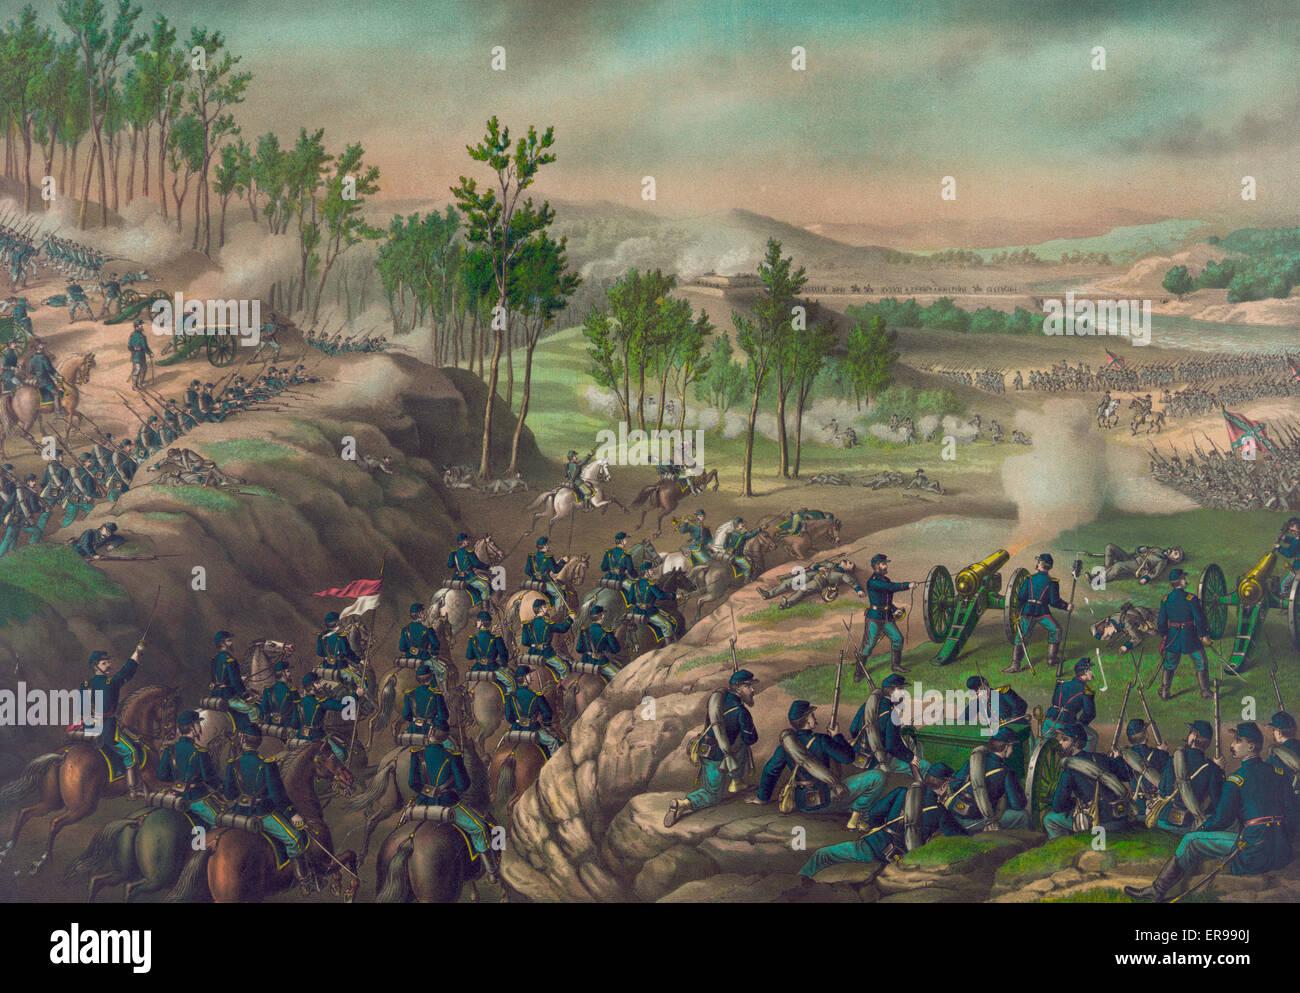 Batalla de resaca--13 de mayo de 16, 1864, fecha c1889. Imagen De Stock